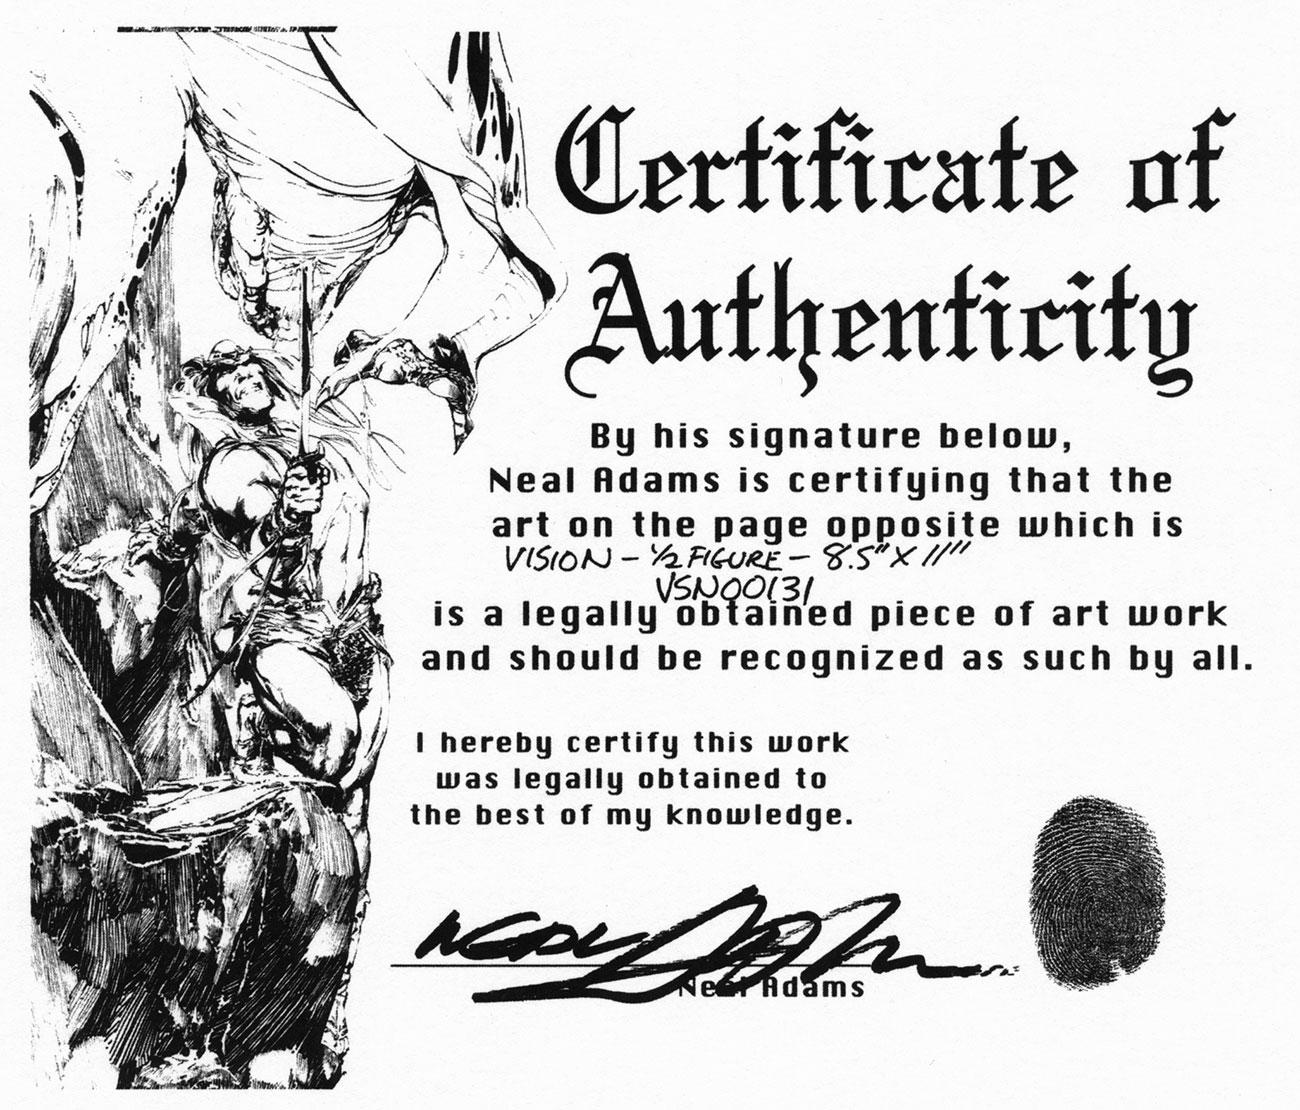 neal-adams-art-certificate